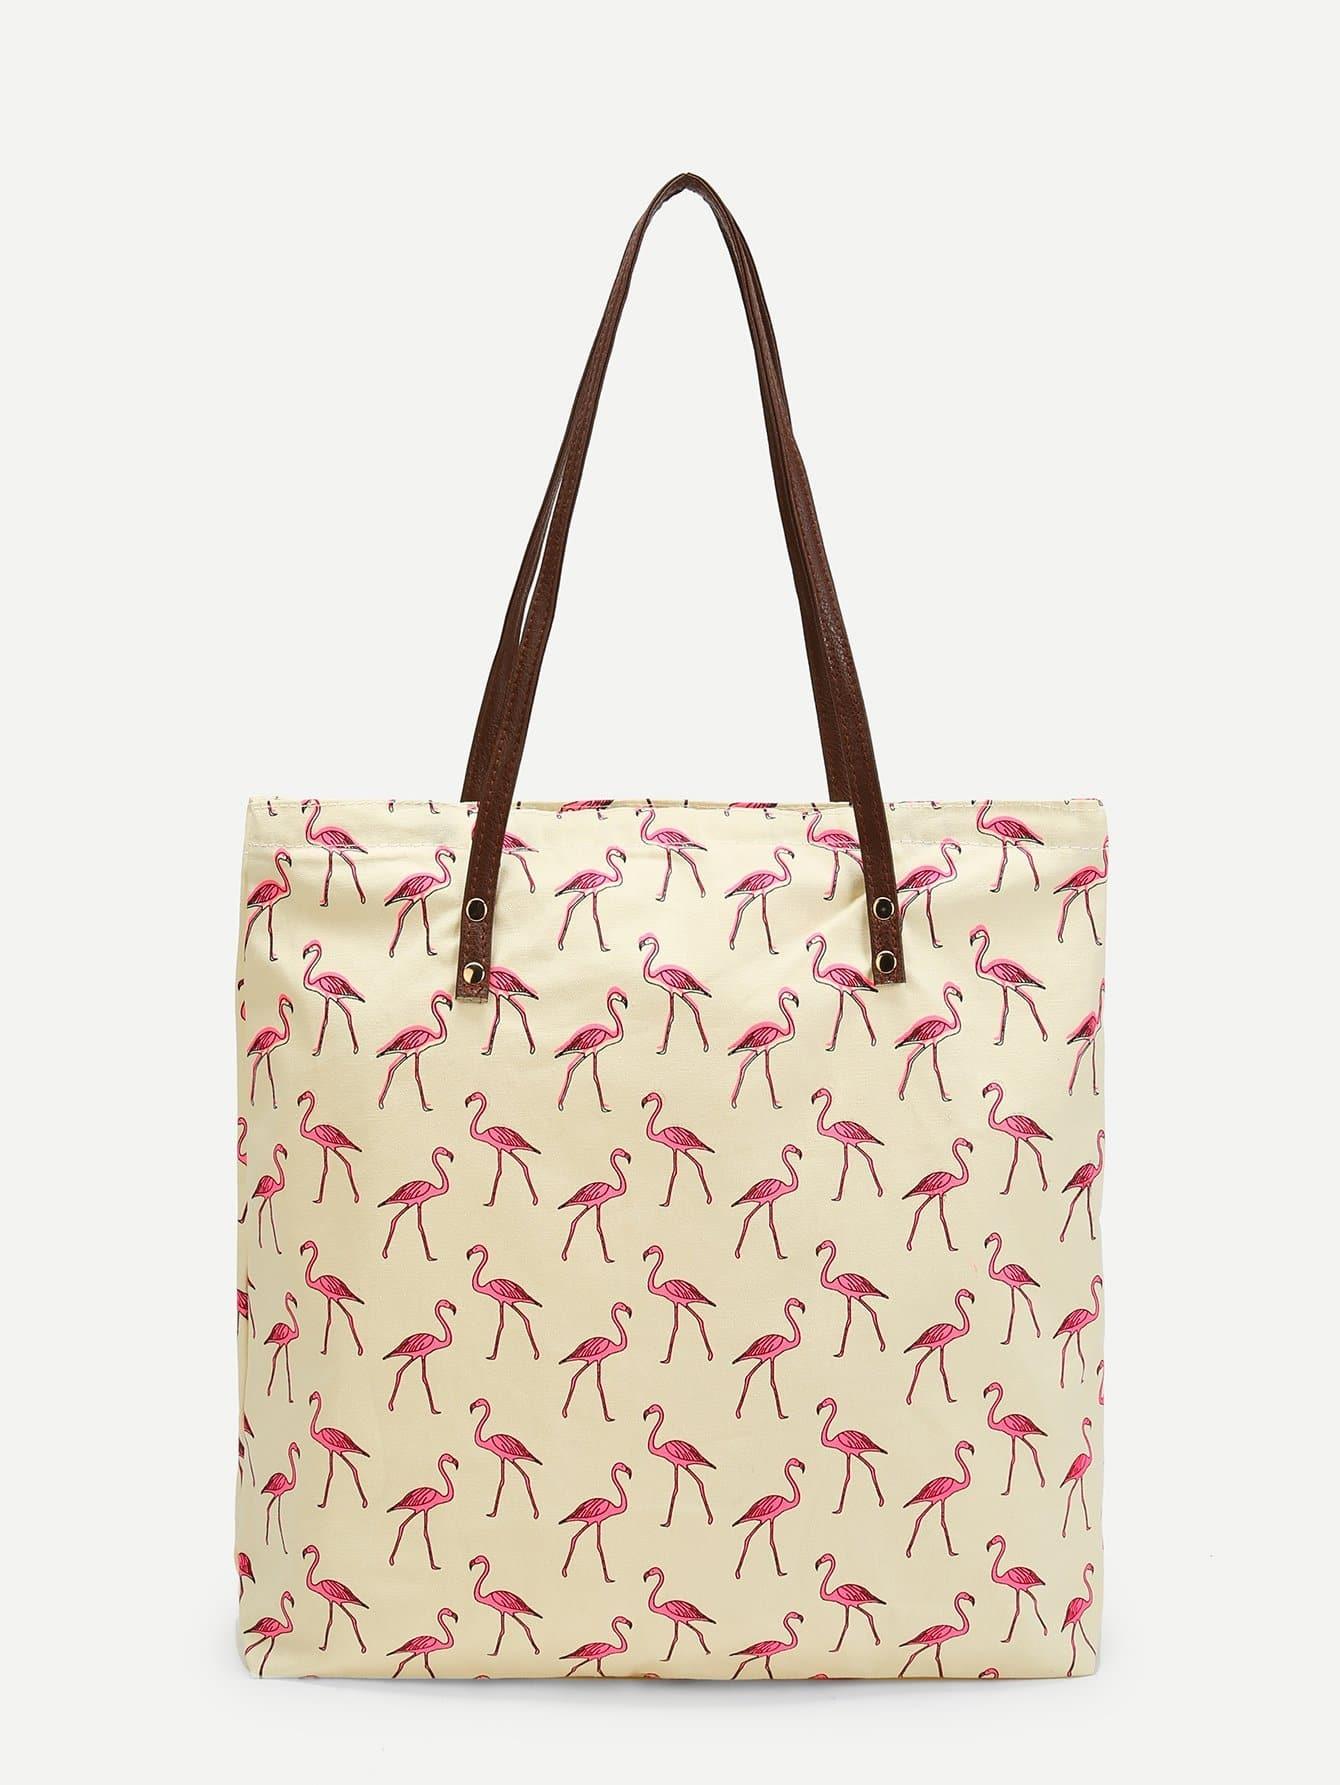 Flamingo Print Tote Bag straw flamingo embroidered tote bag